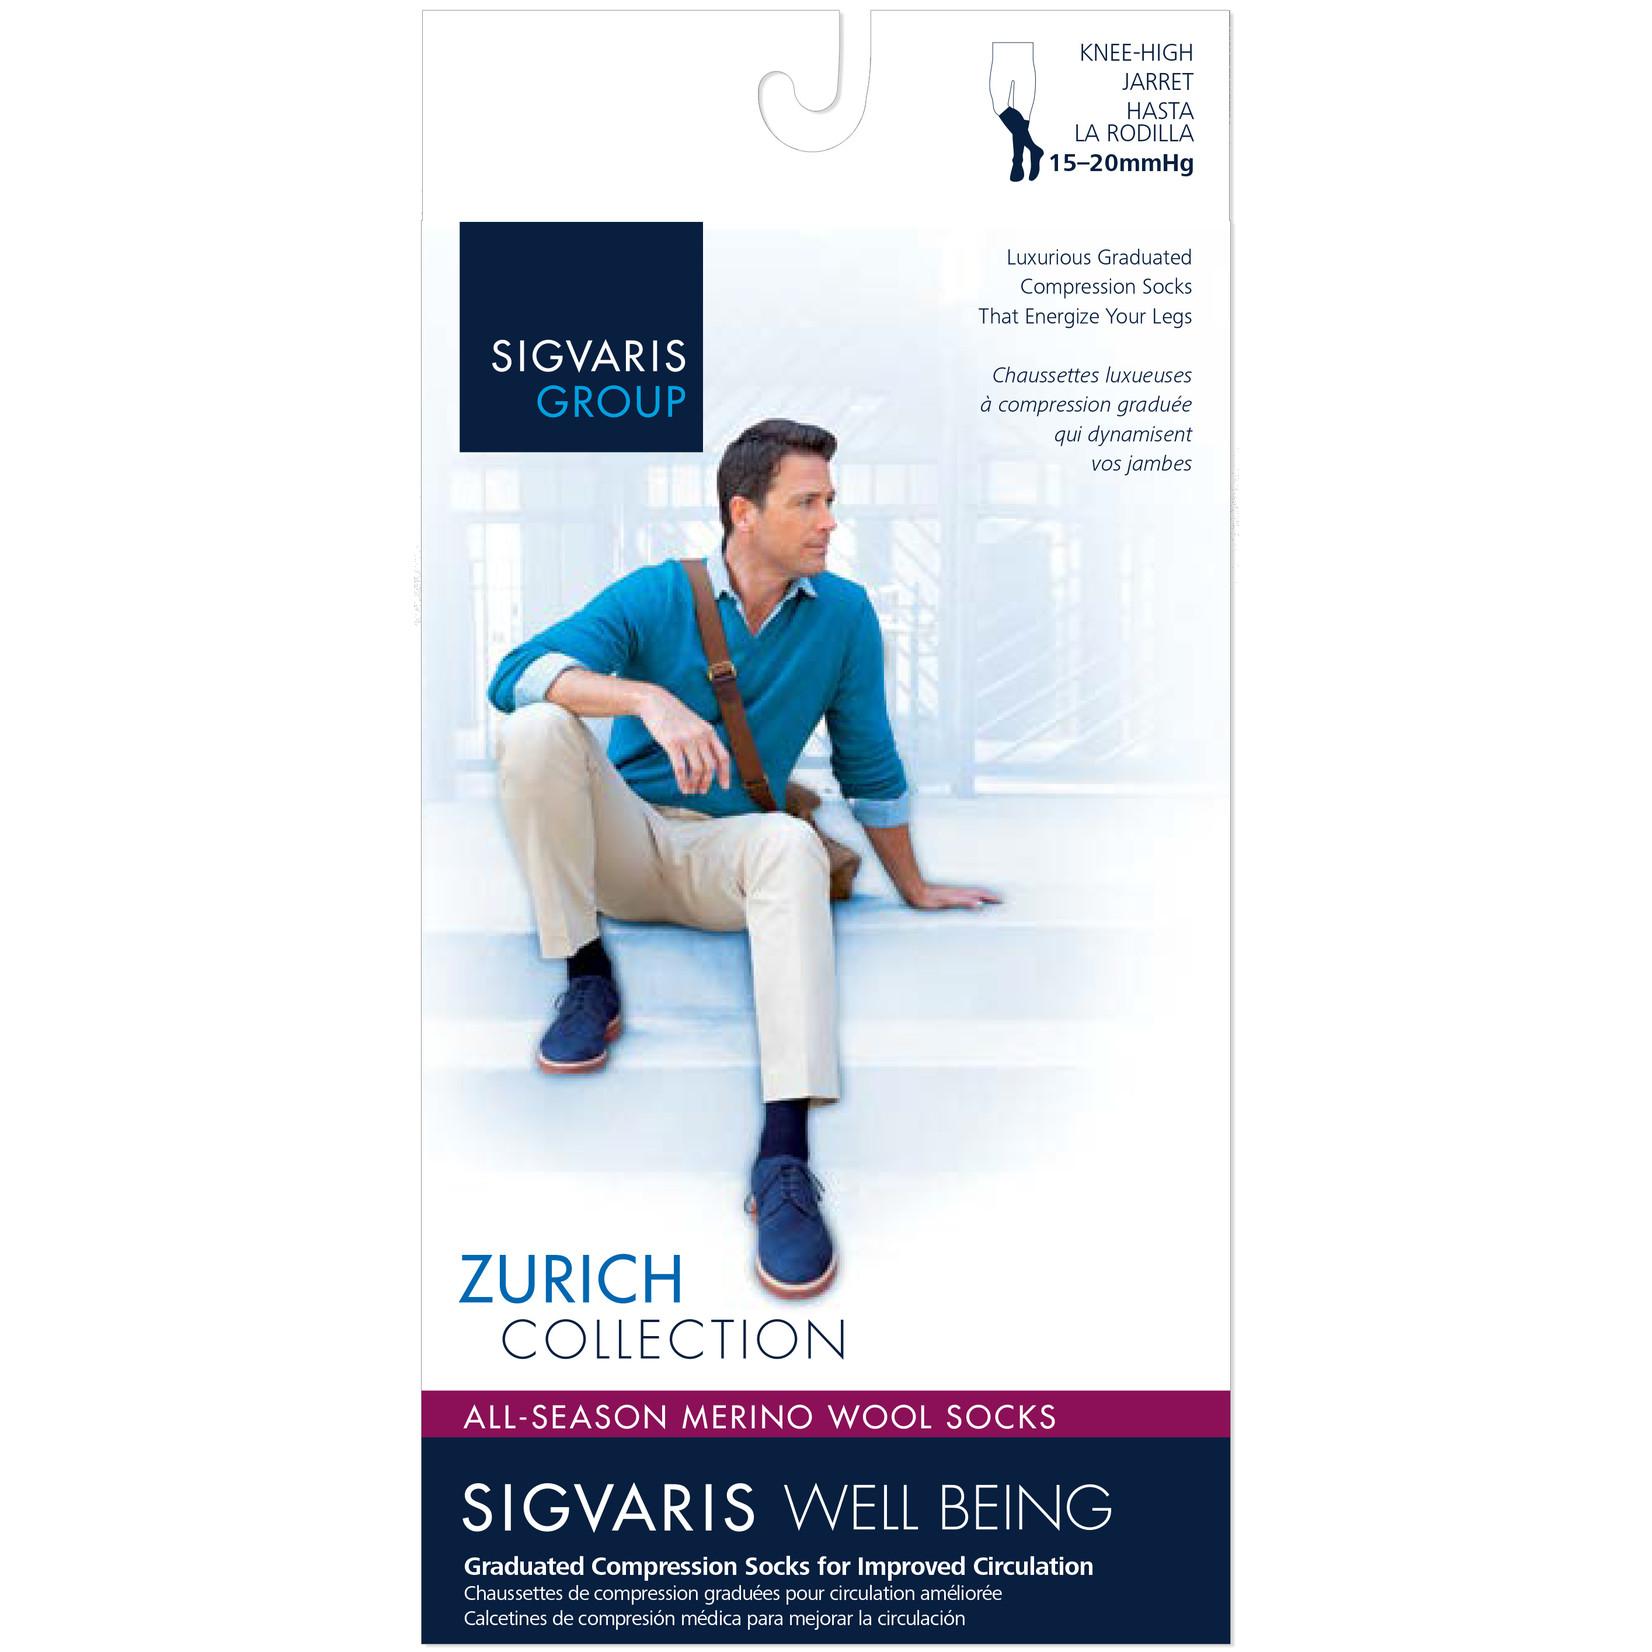 SIGVARIS Men's All-Season Merino Wool Calf 15-20mmHg